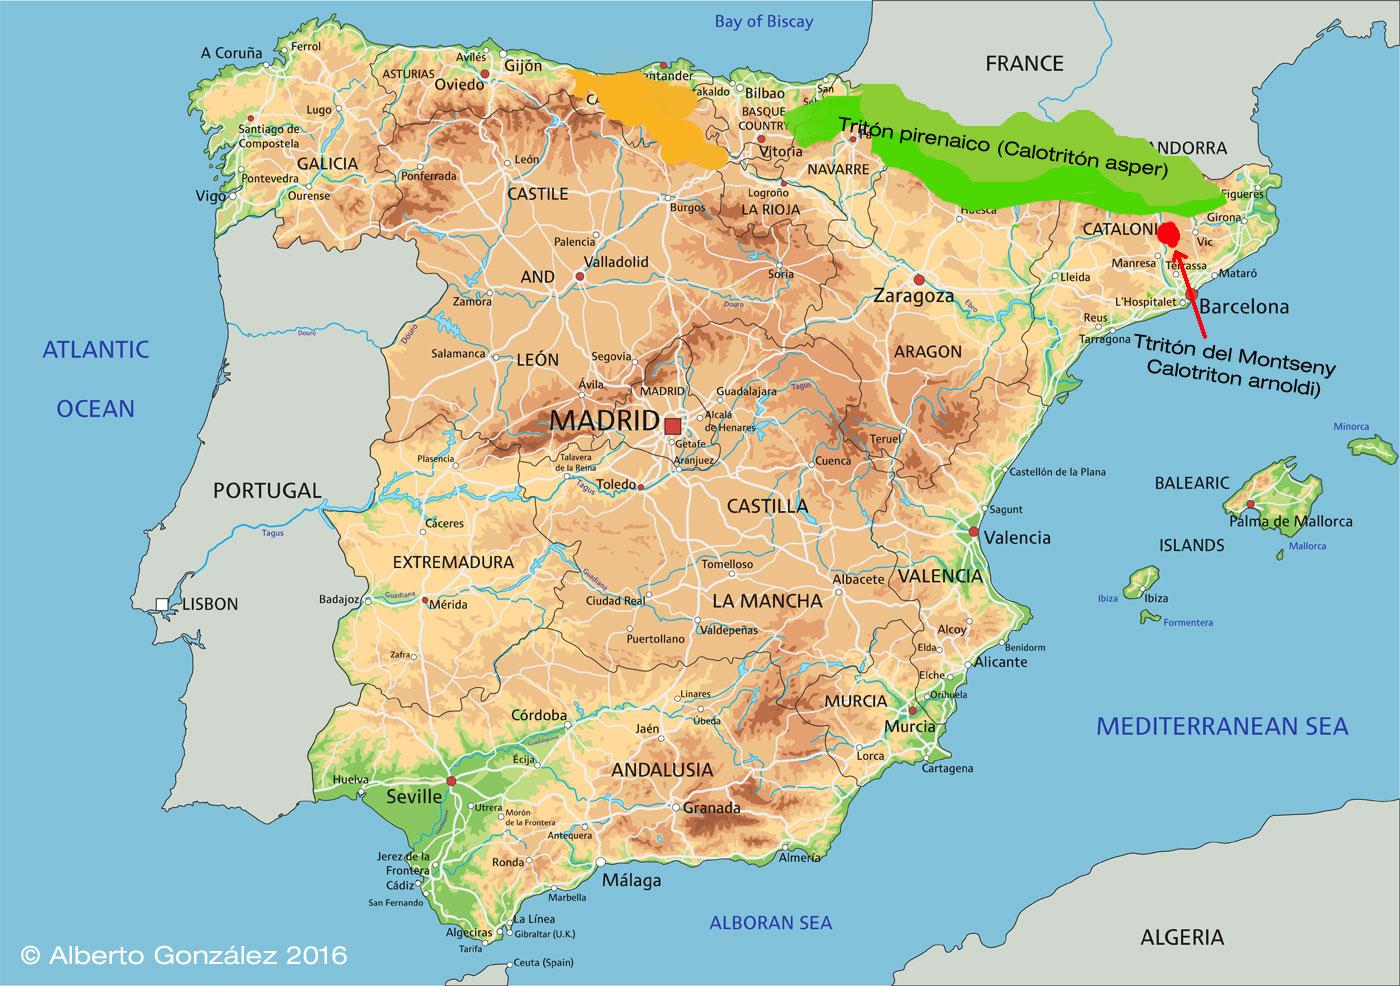 mapa-distribucion-triton-pirenaico-calotriton-asper-y-calotriton-arnoldi